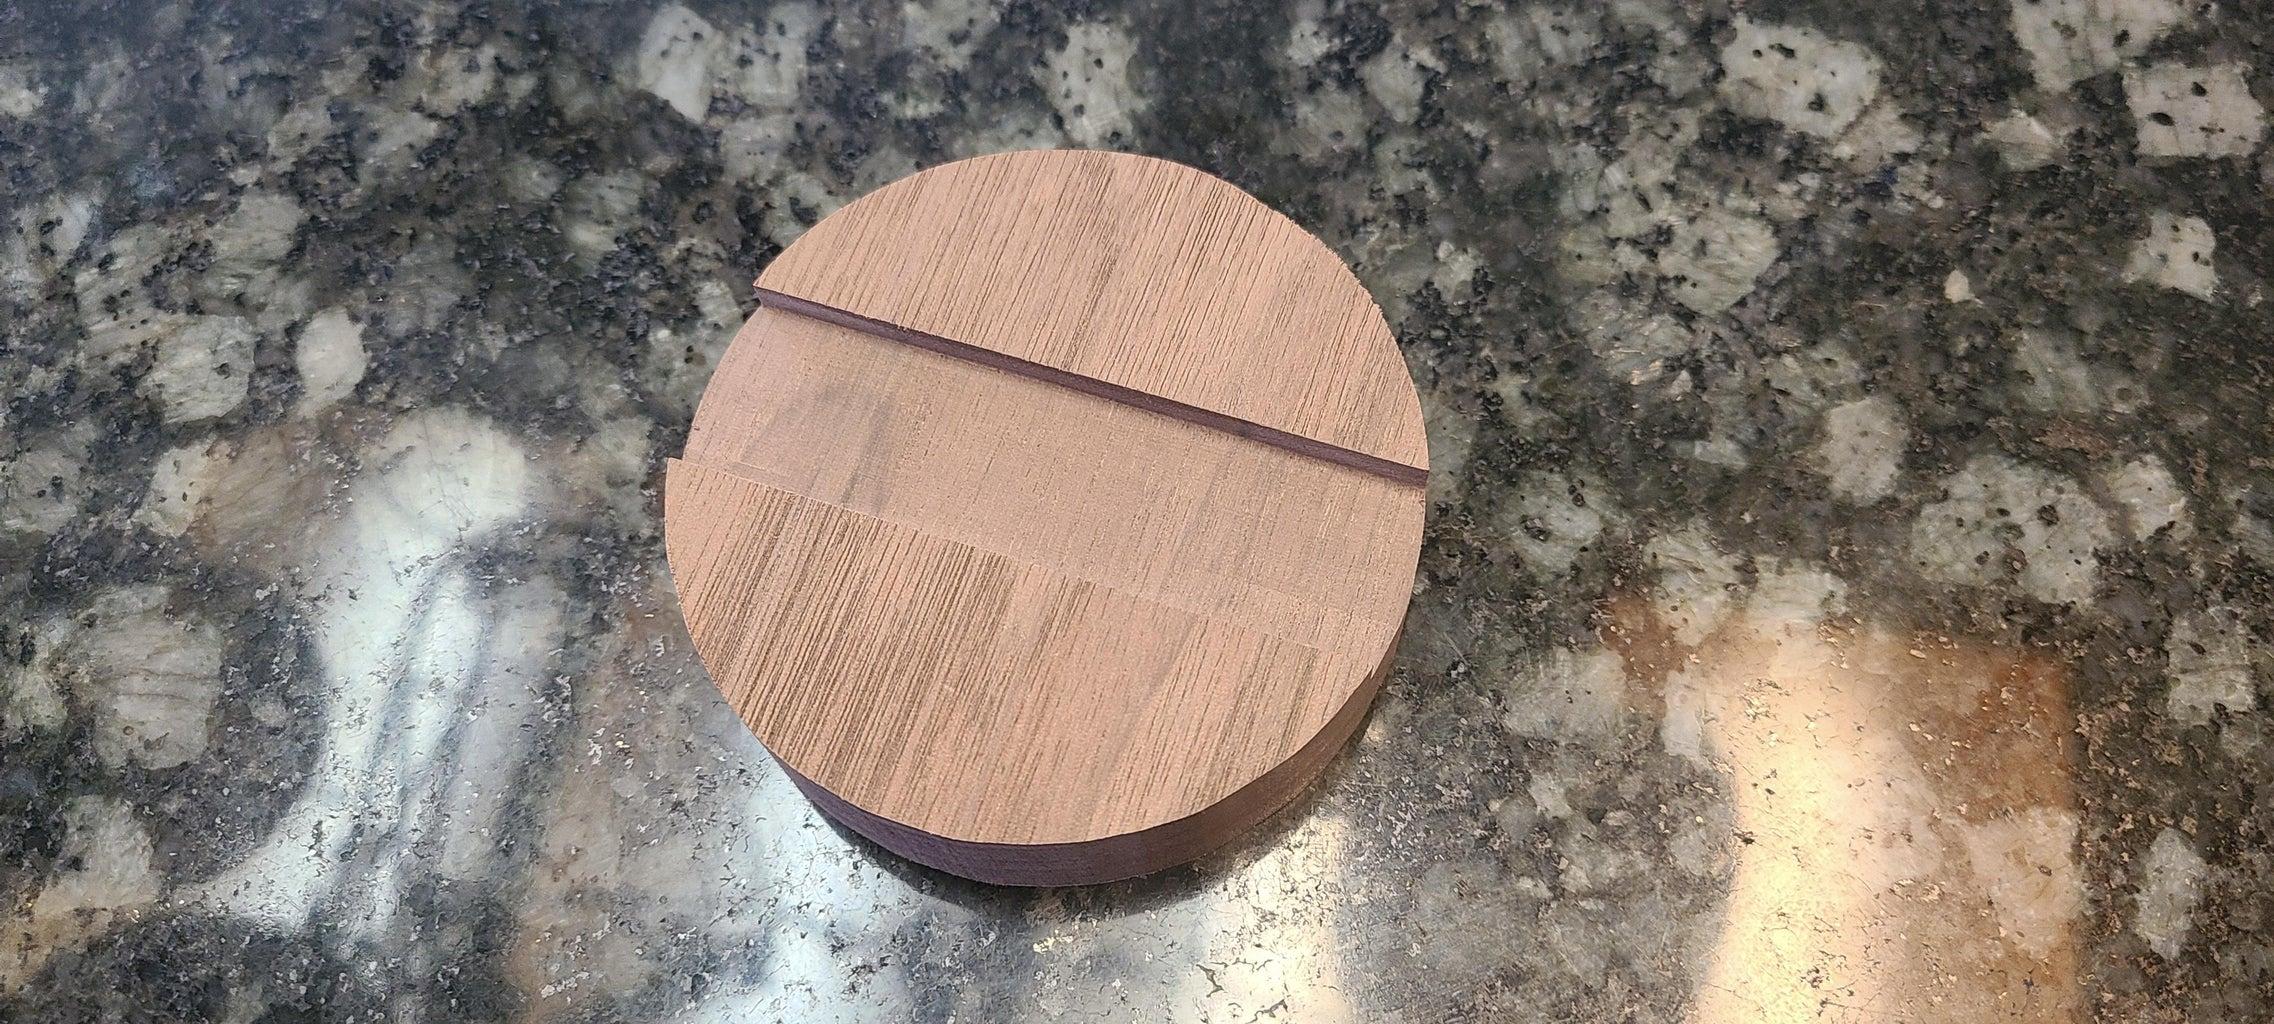 Building the End Caps